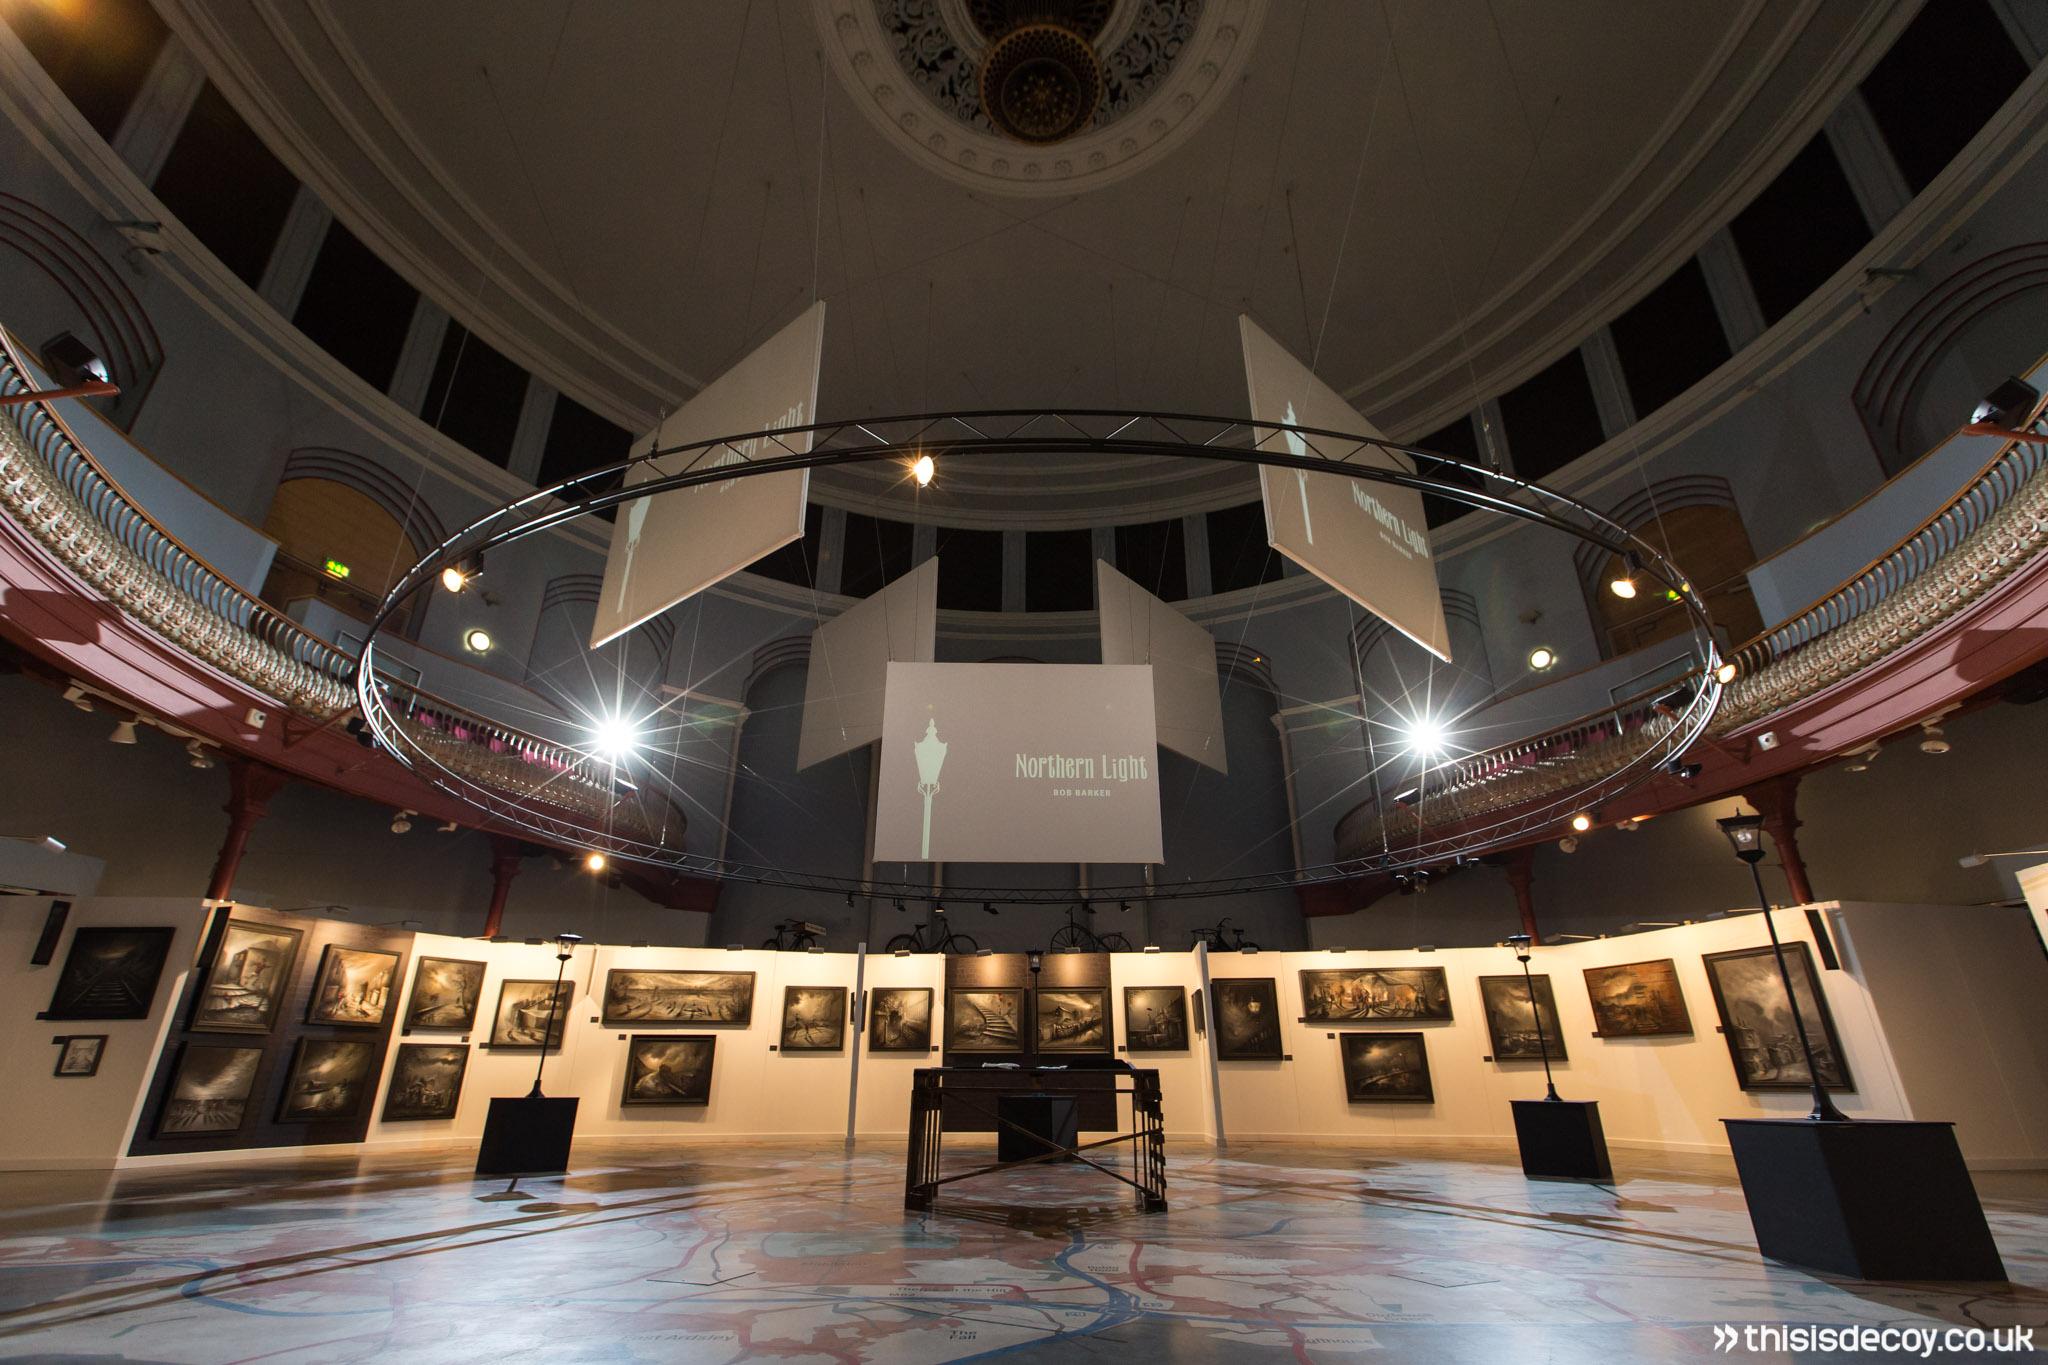 Northern Light - Bob Barker - Leeds City Museum - 20 Jan 17 - Decoy Media - 2.jpg